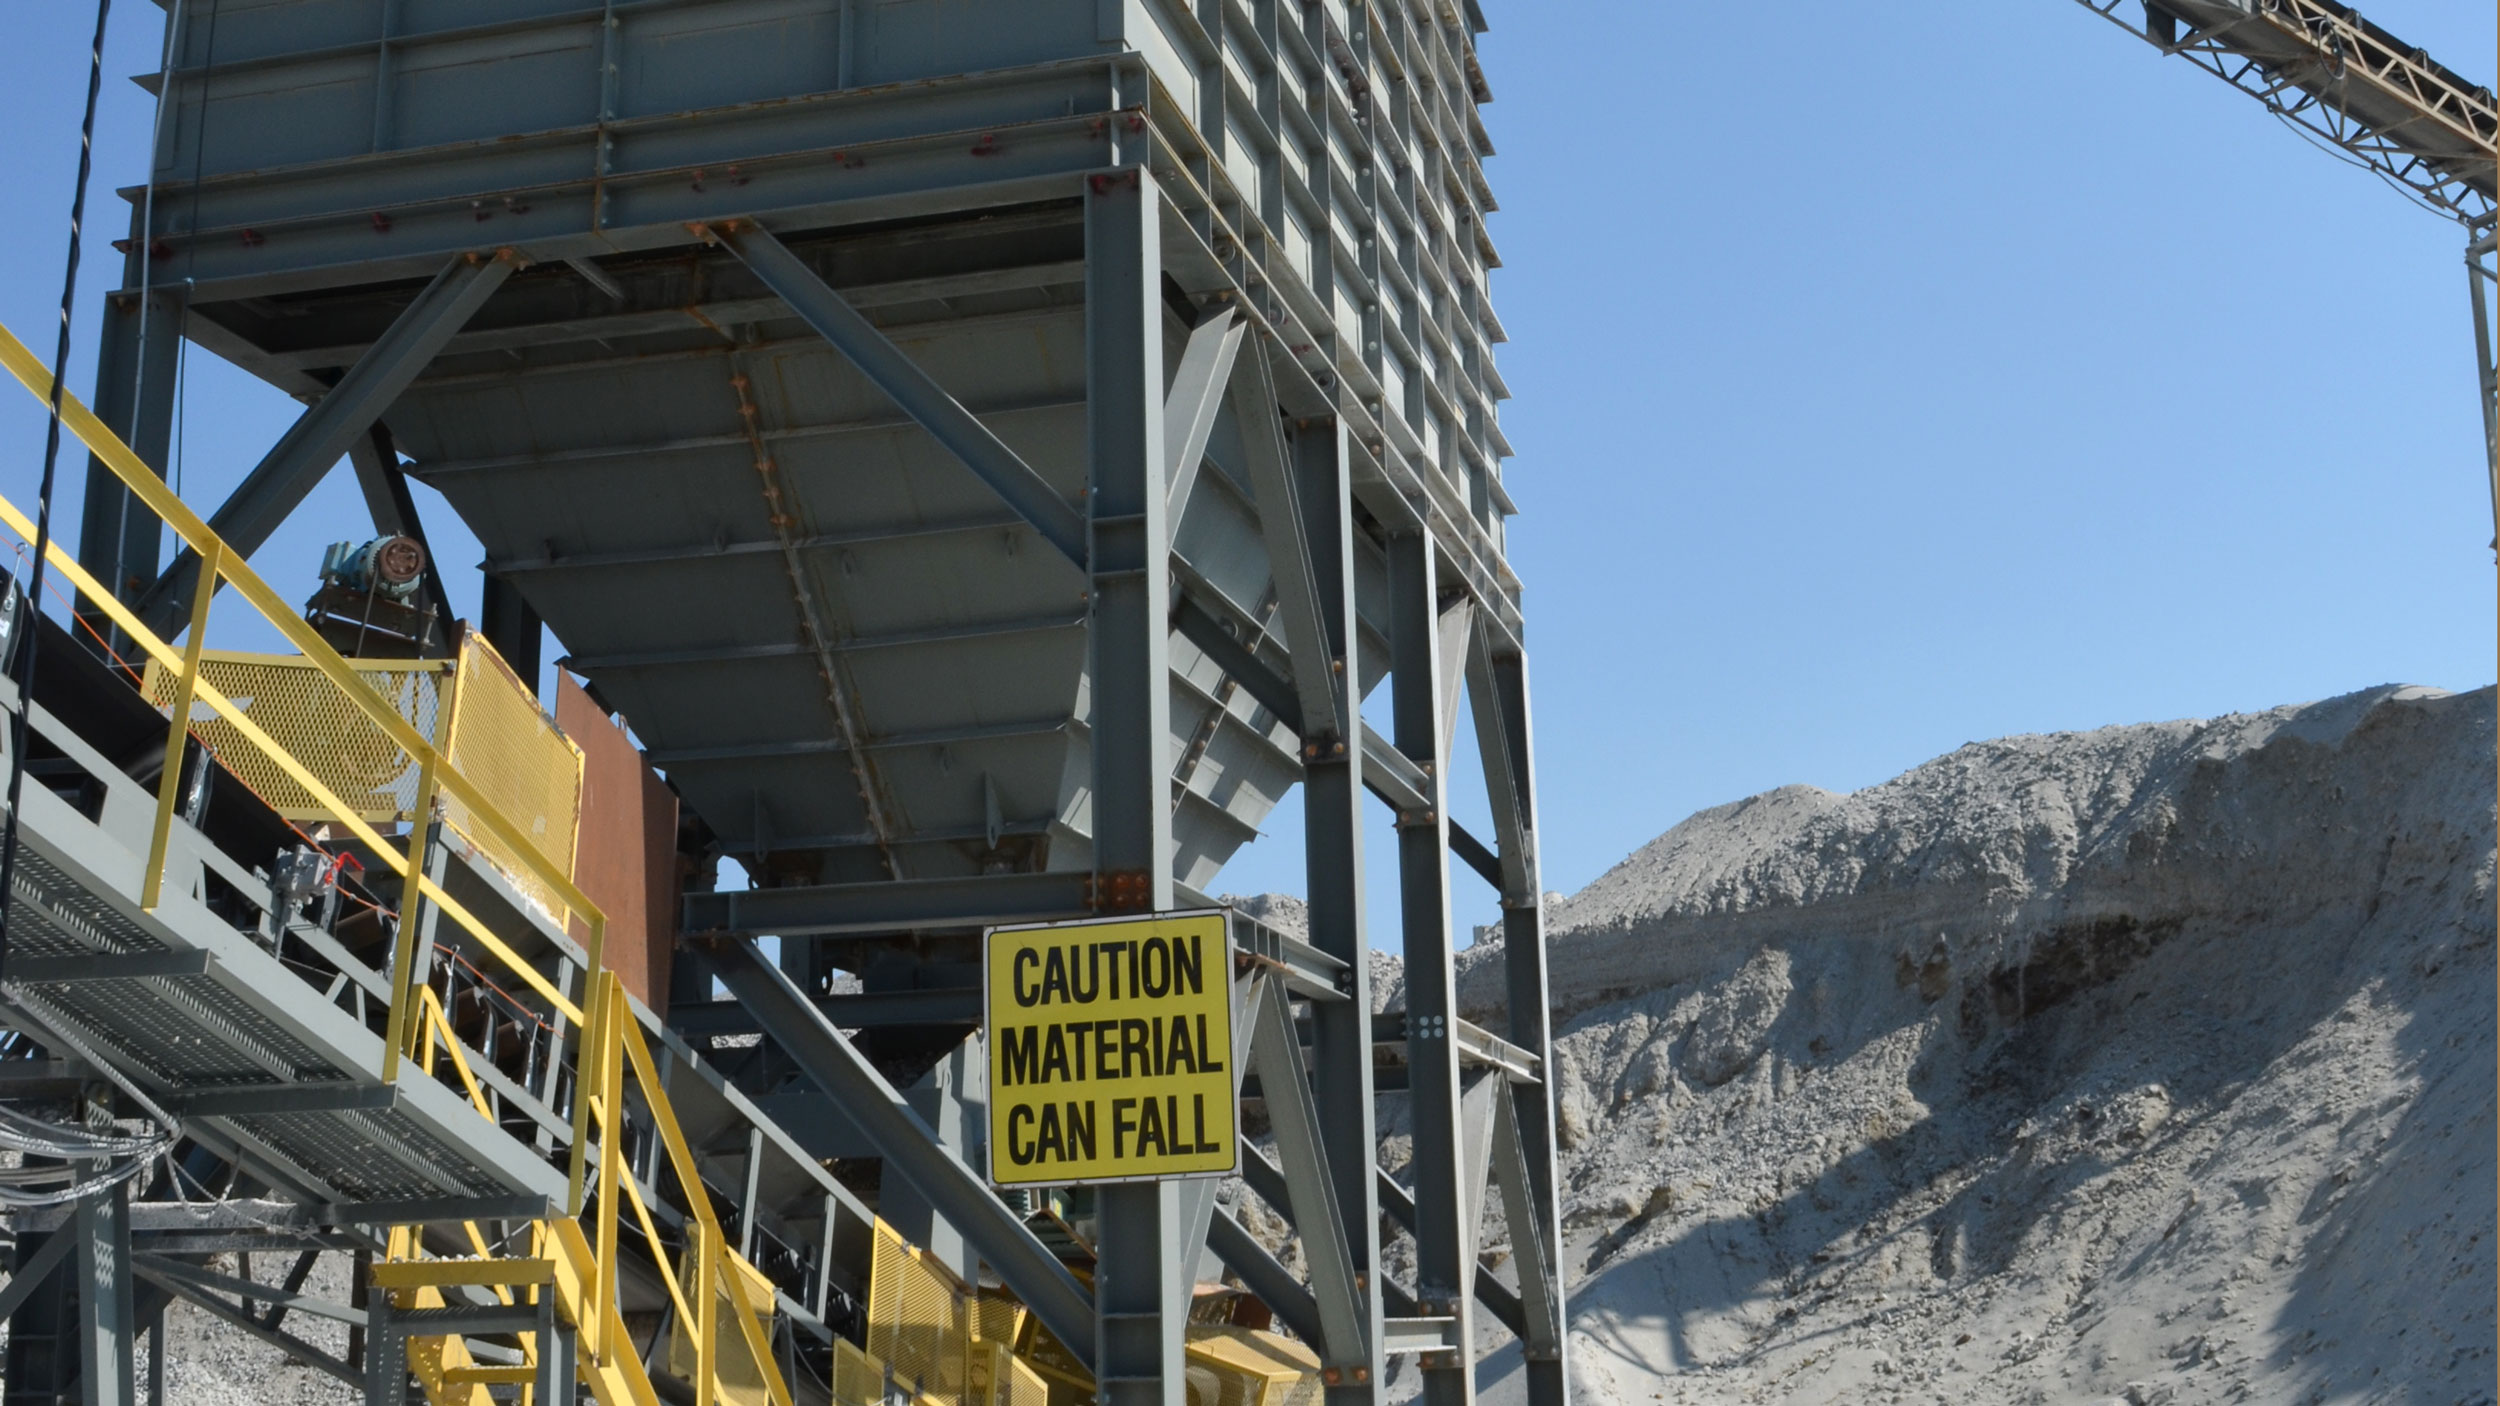 Bin at the Francesville quarry